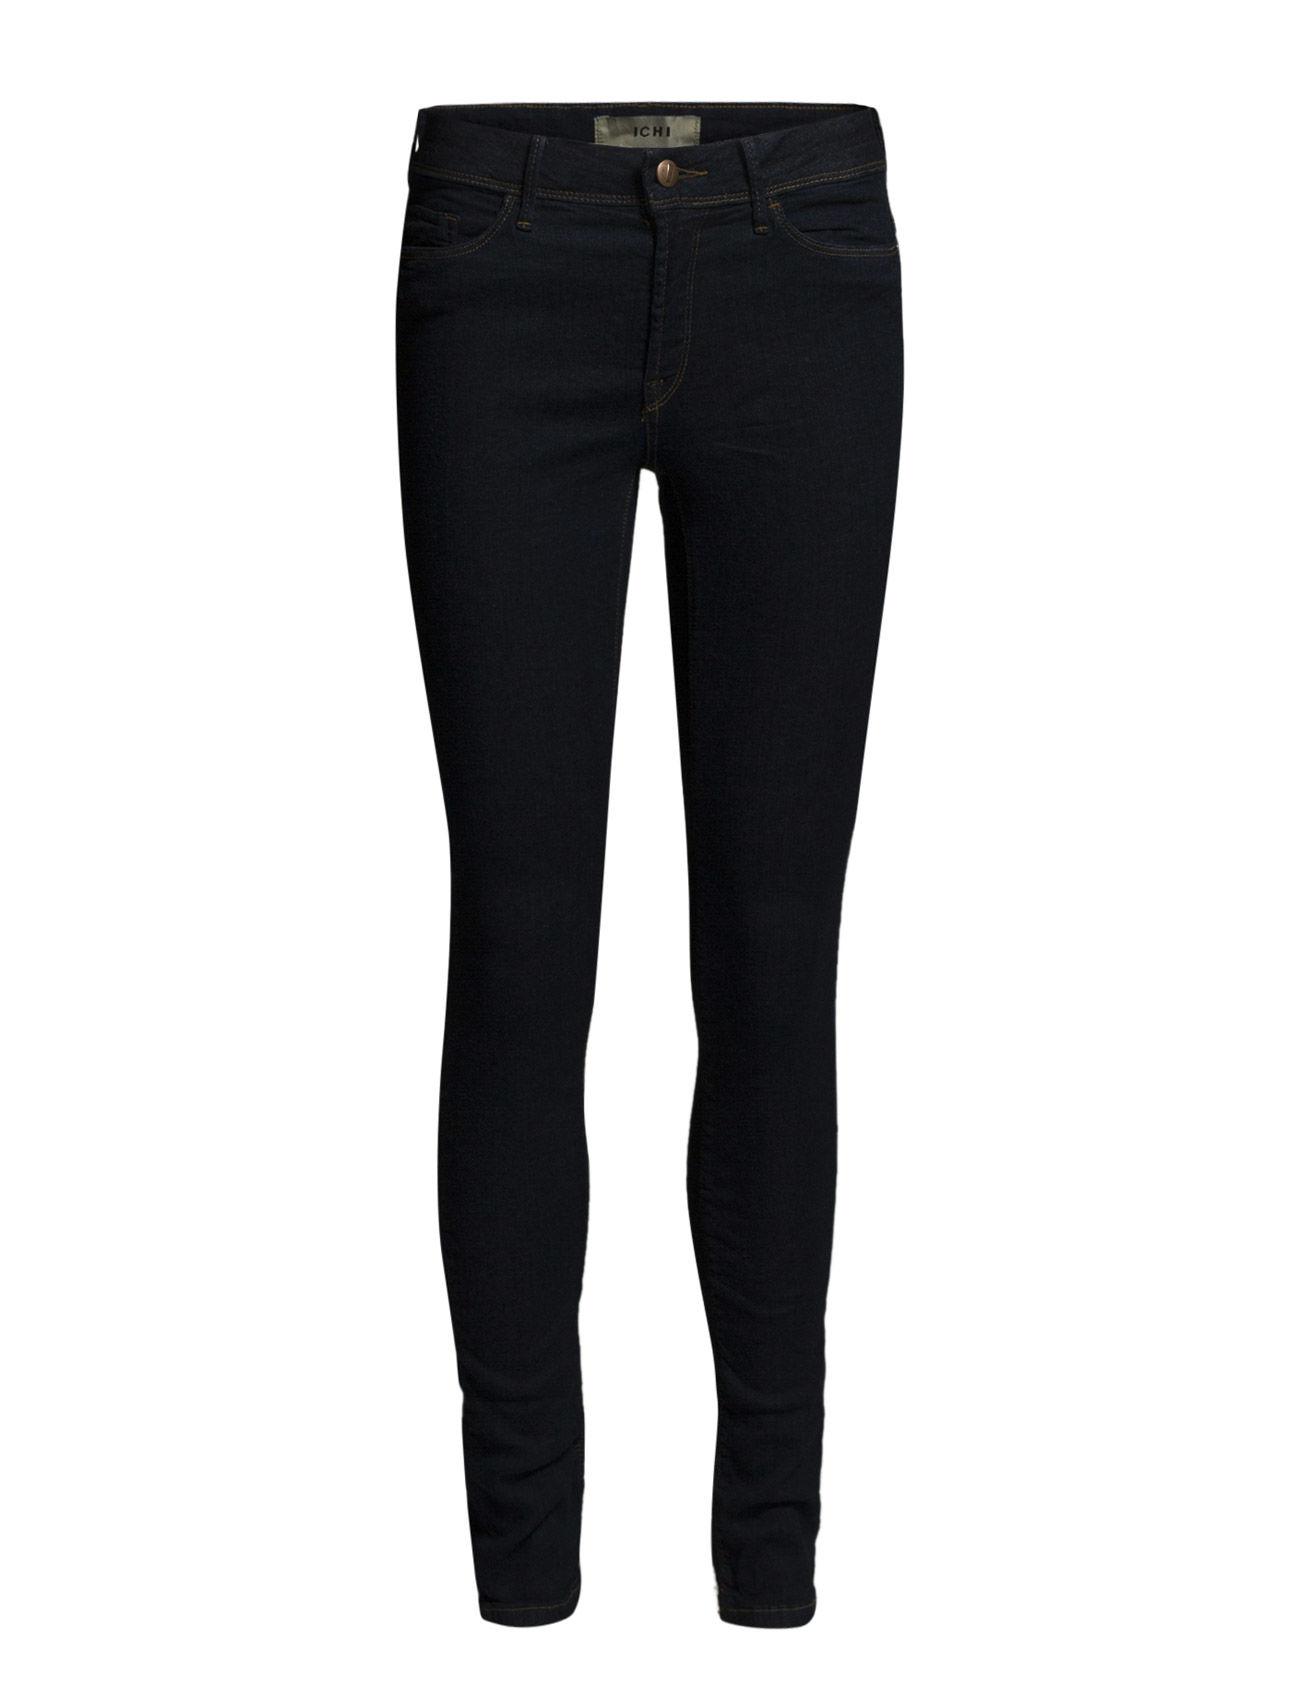 Erin Izaro Dark ICHI Jeans til Kvinder i